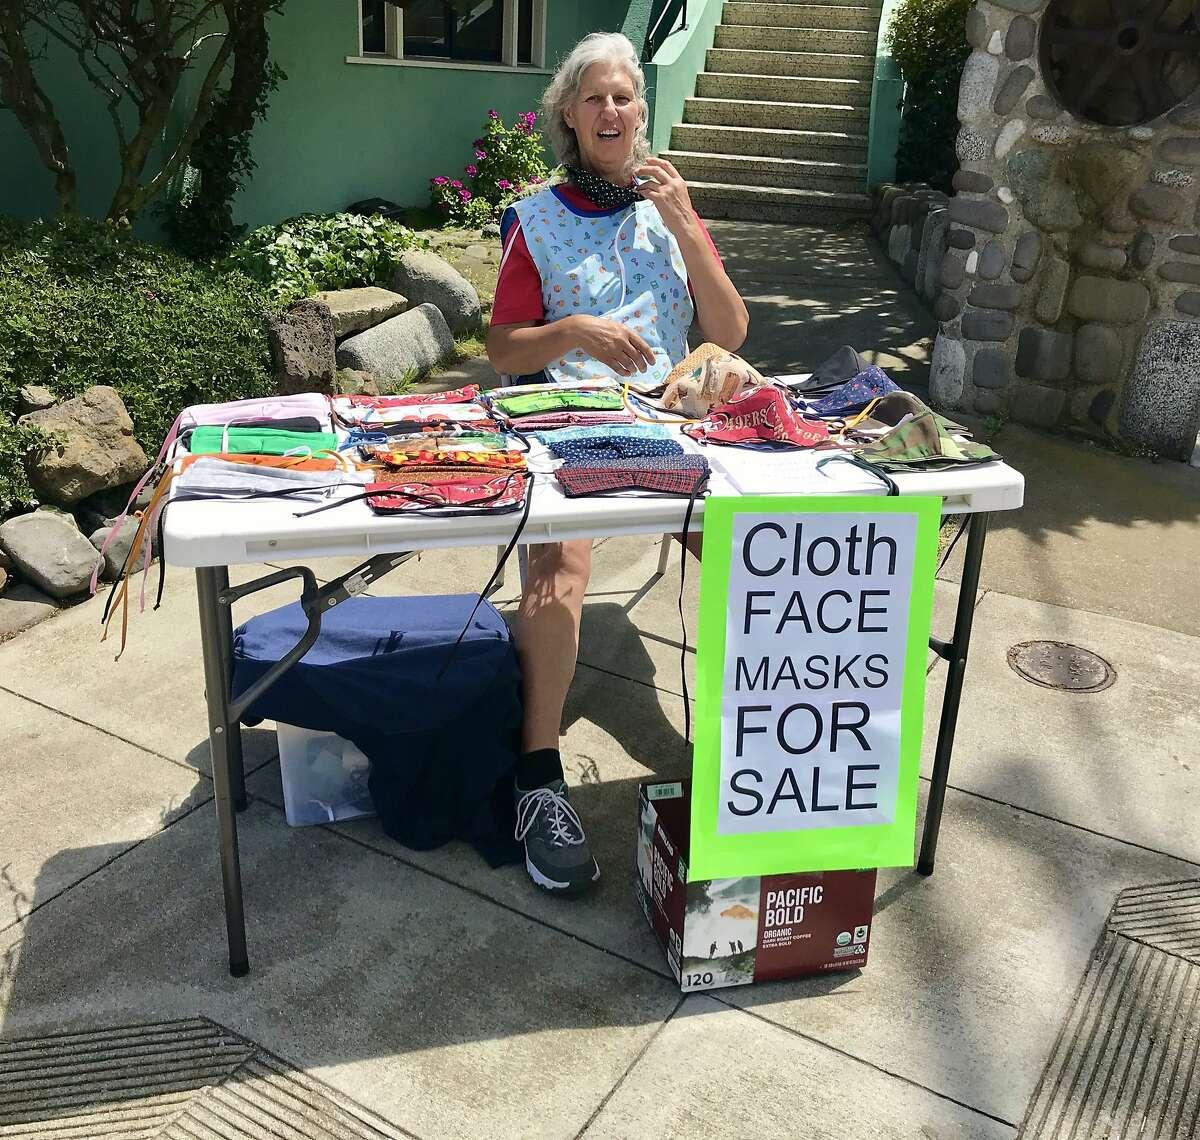 Eileen Purcell of Reno sells homemade face masks on street corner in Sunnyside neighborhood of San Francisco